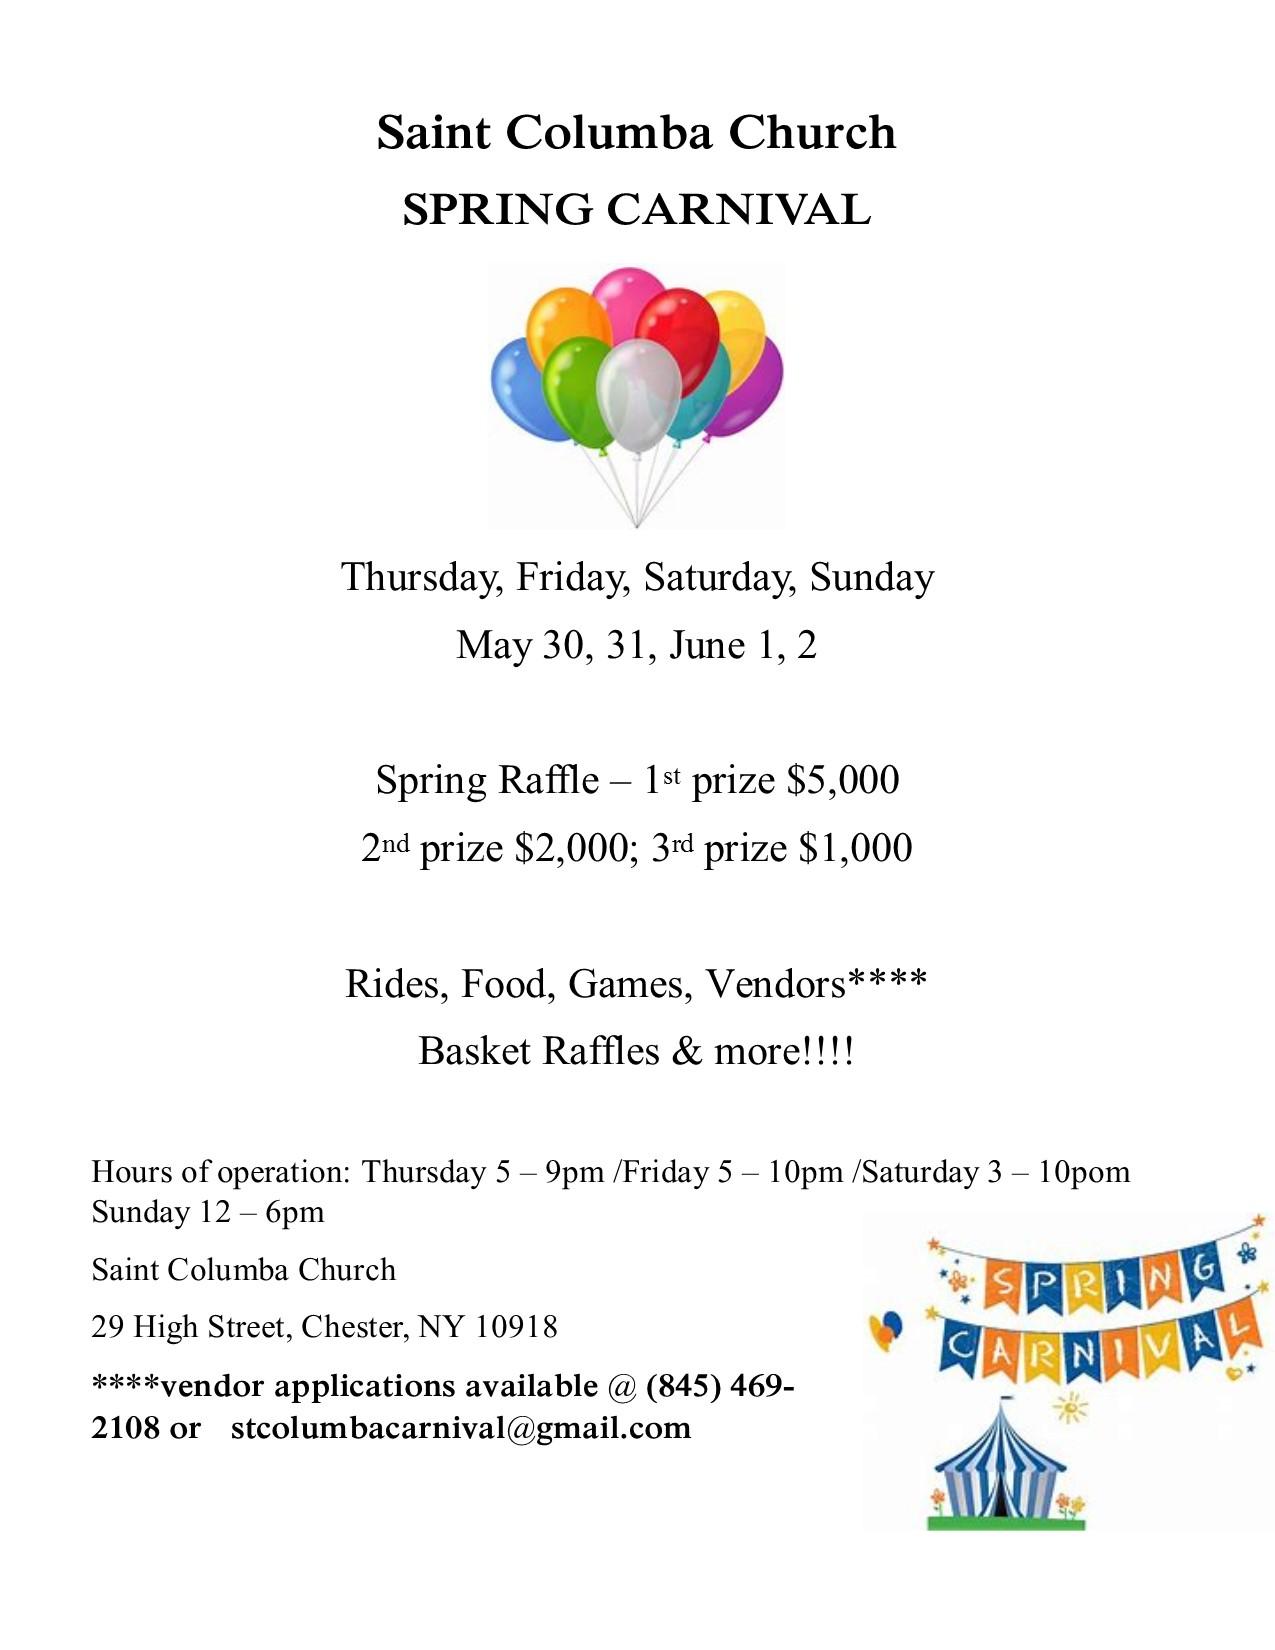 St  Columba Spring Carnival – Village of Chester New York